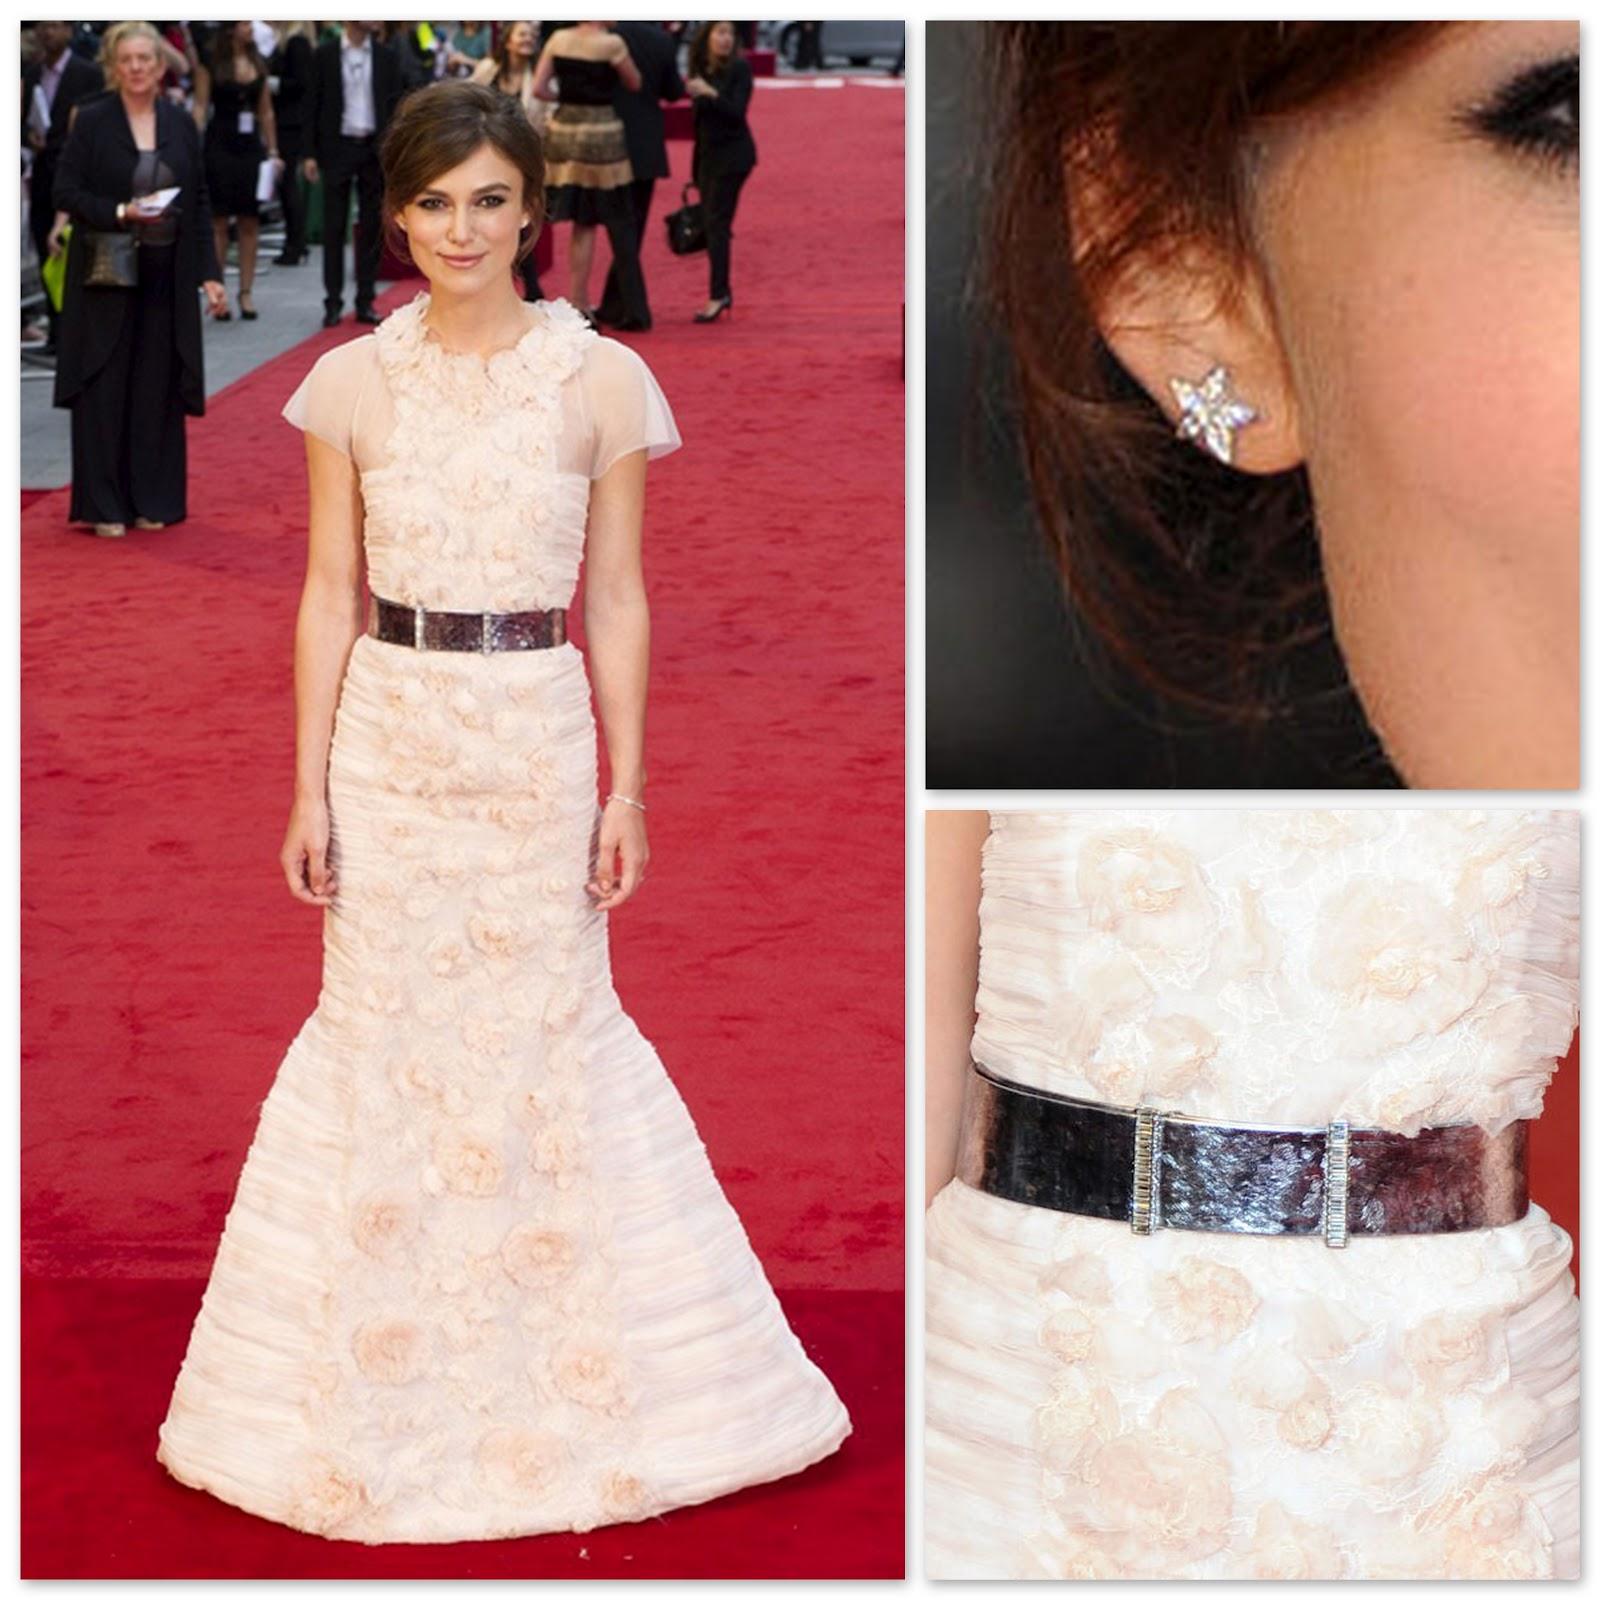 http://3.bp.blogspot.com/-o6fToJpcu3E/UEor-rl2ryI/AAAAAAAAH18/r7xXc3AXBkY/s1600/best+dressed2.jpg